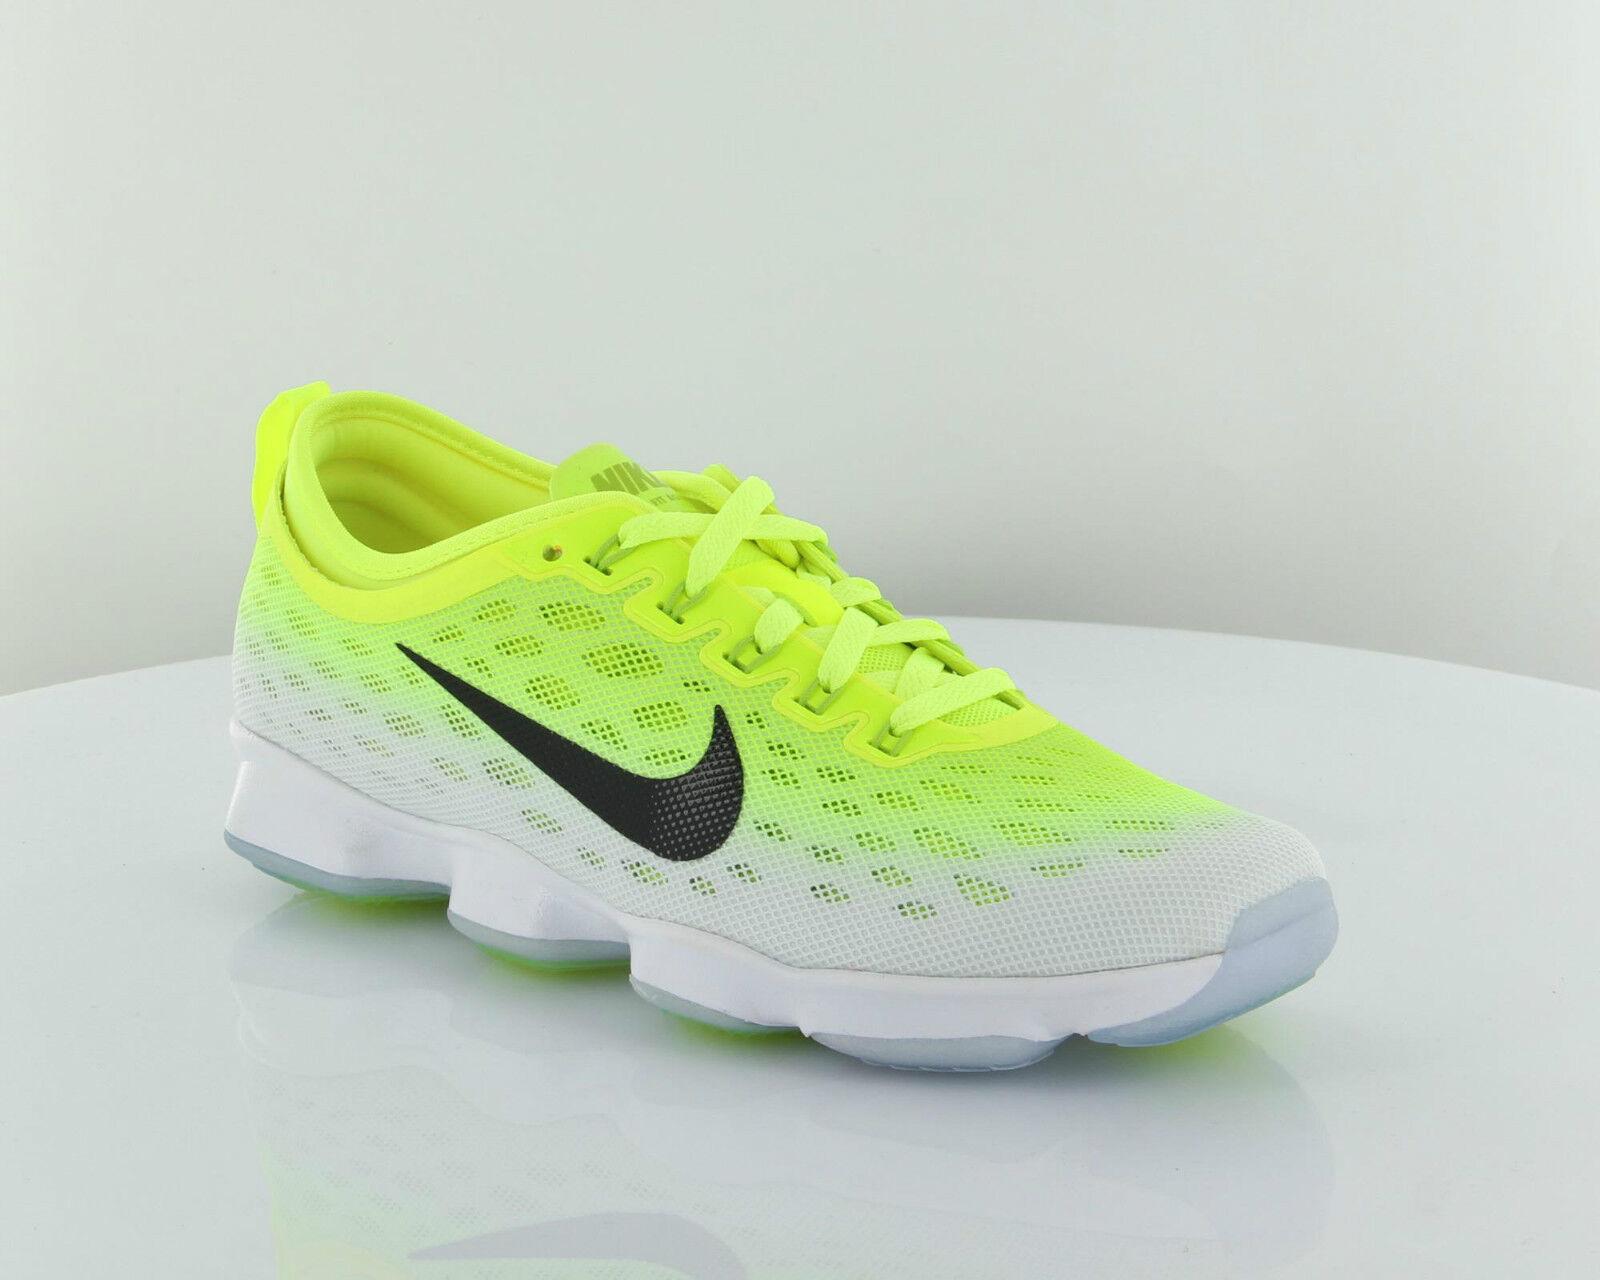 30b180cf3cca9 ... Nike 684984 Zoom Fit Agility  130 Women s Training Training Training Shoes  Running More Colors e78b20 ...